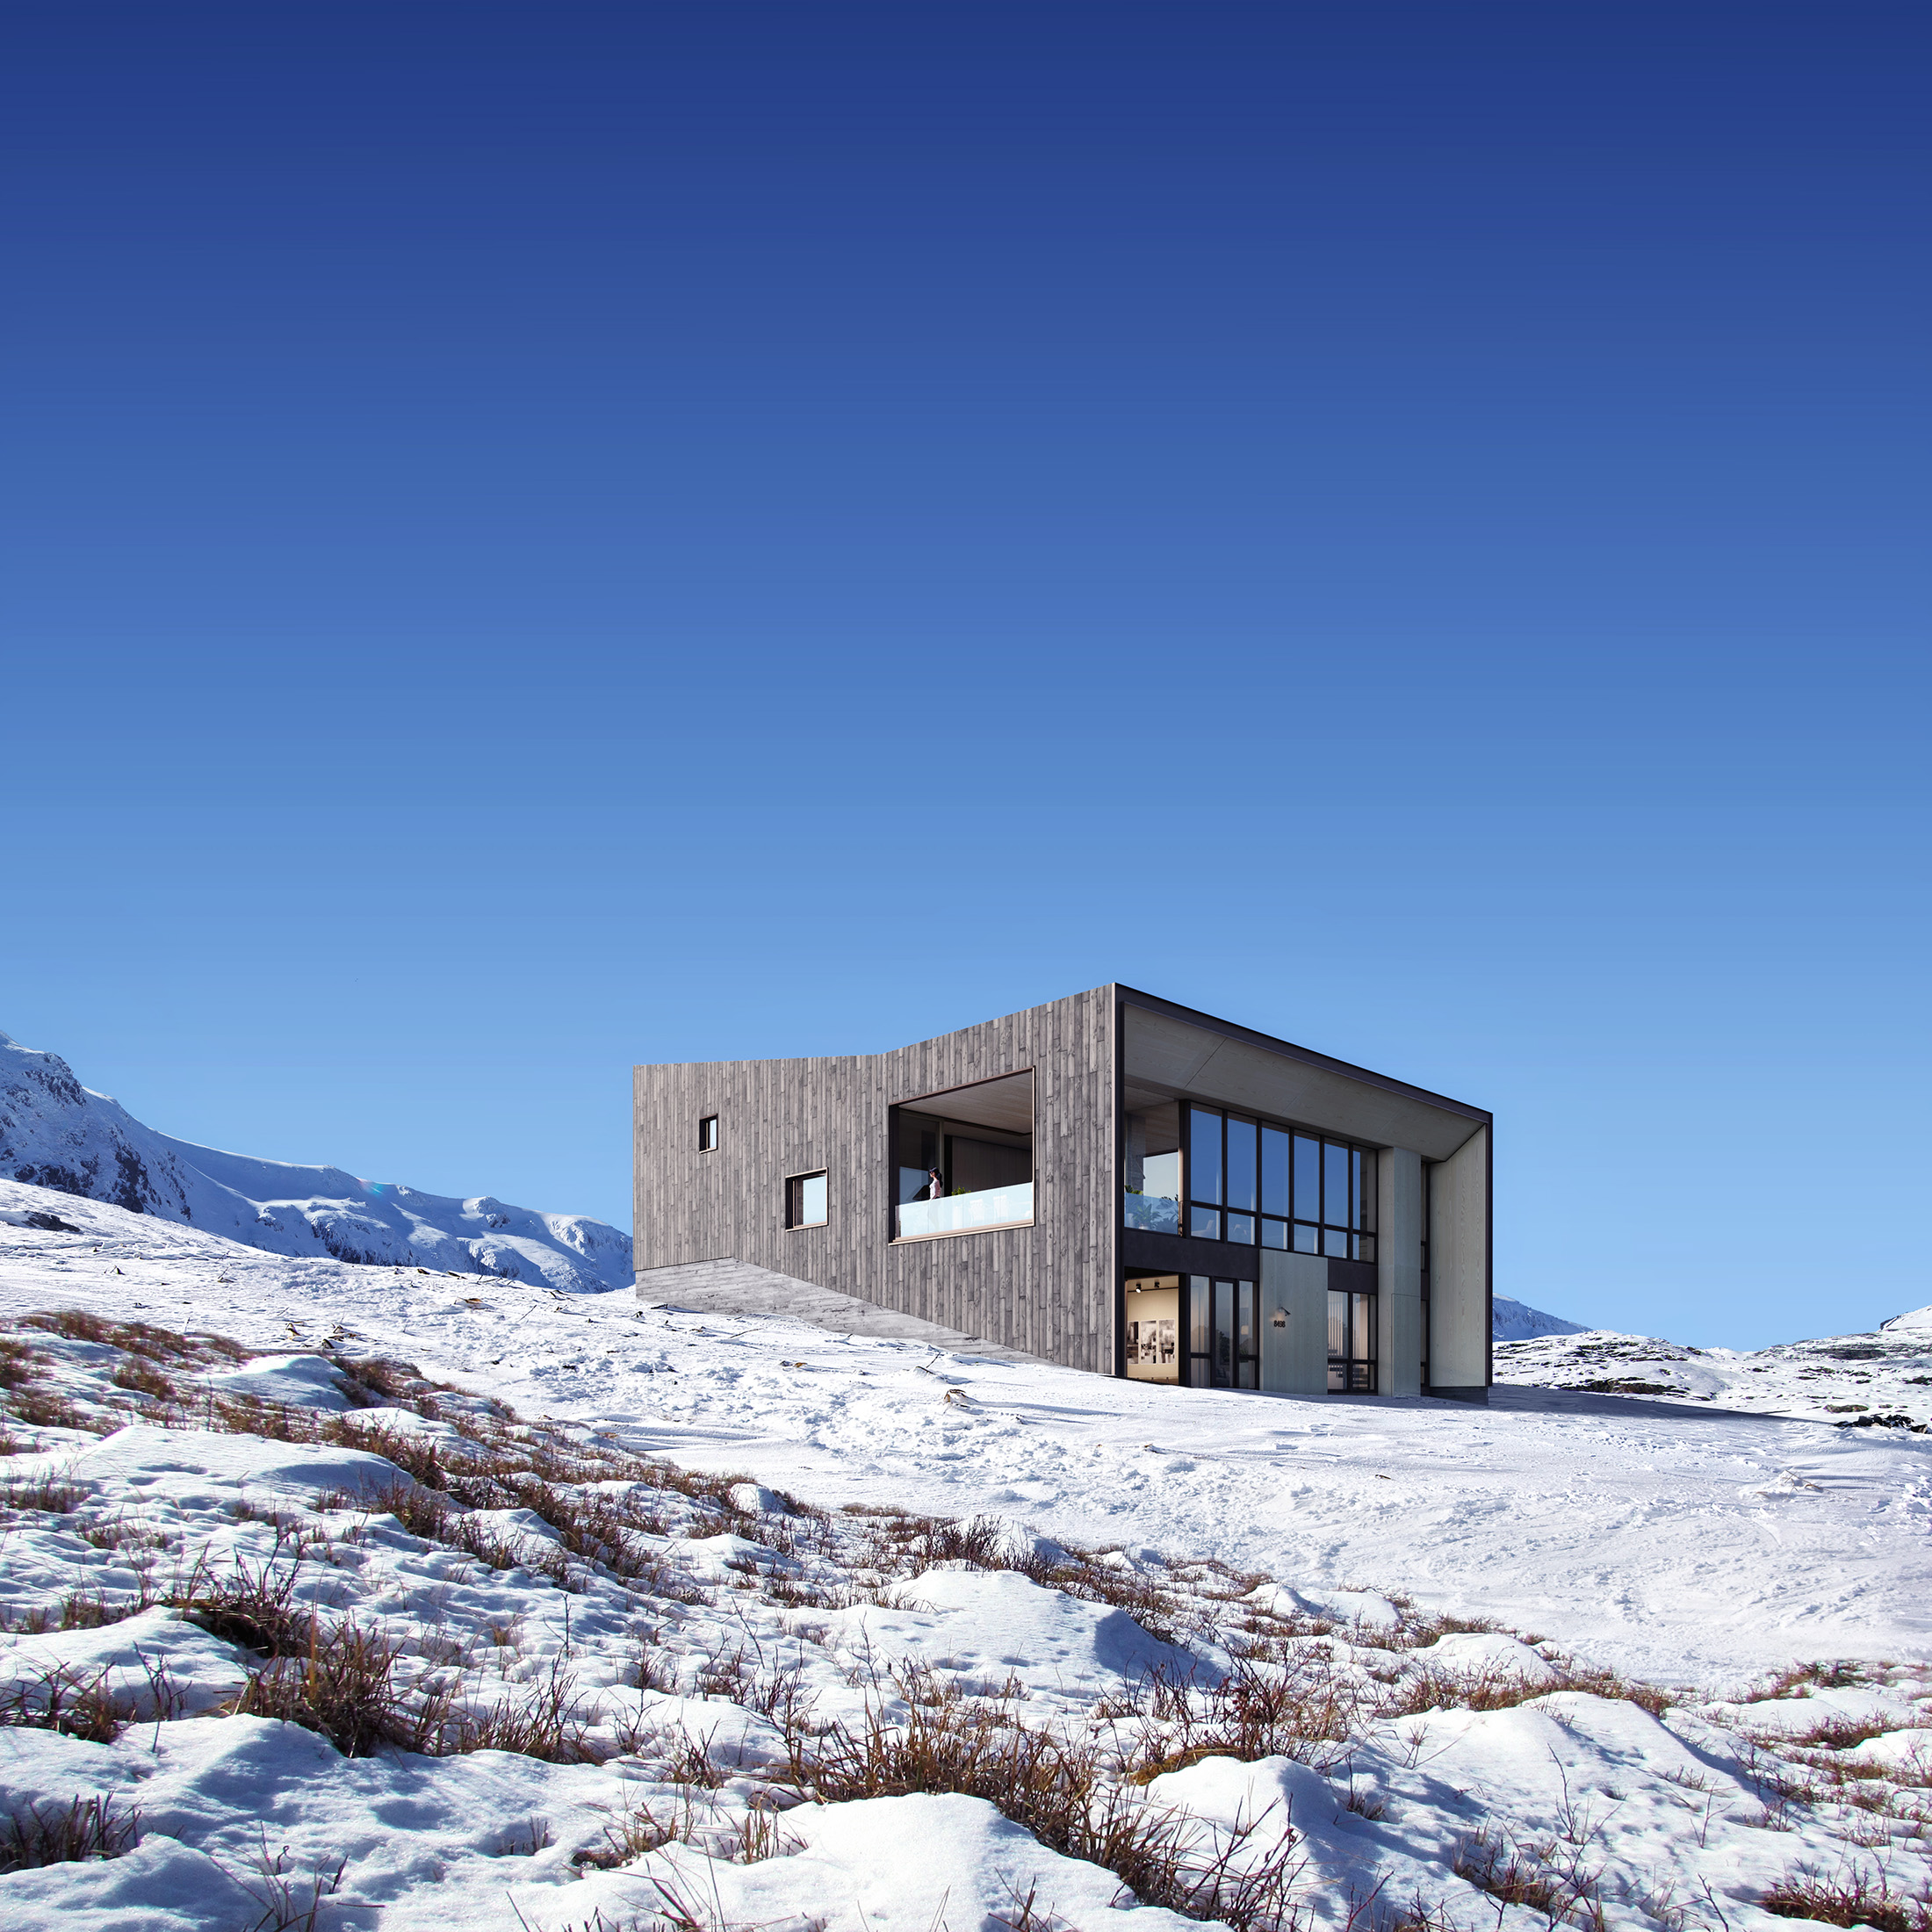 Studio MA, The Gilbert Cabin, Utah, EEUU 2020